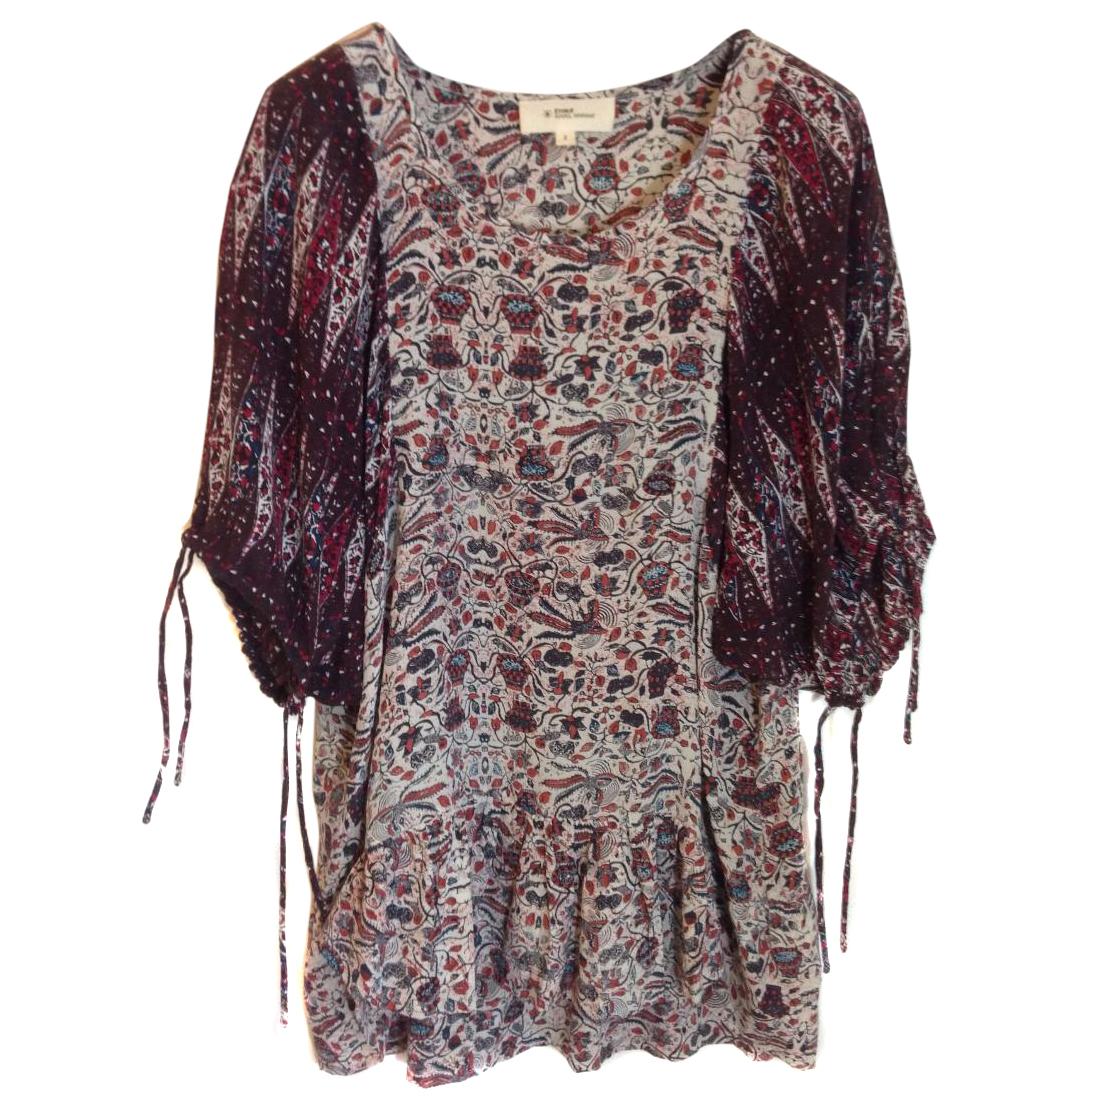 Isabel Marant Etoile Anouk Floral Silk Blouse